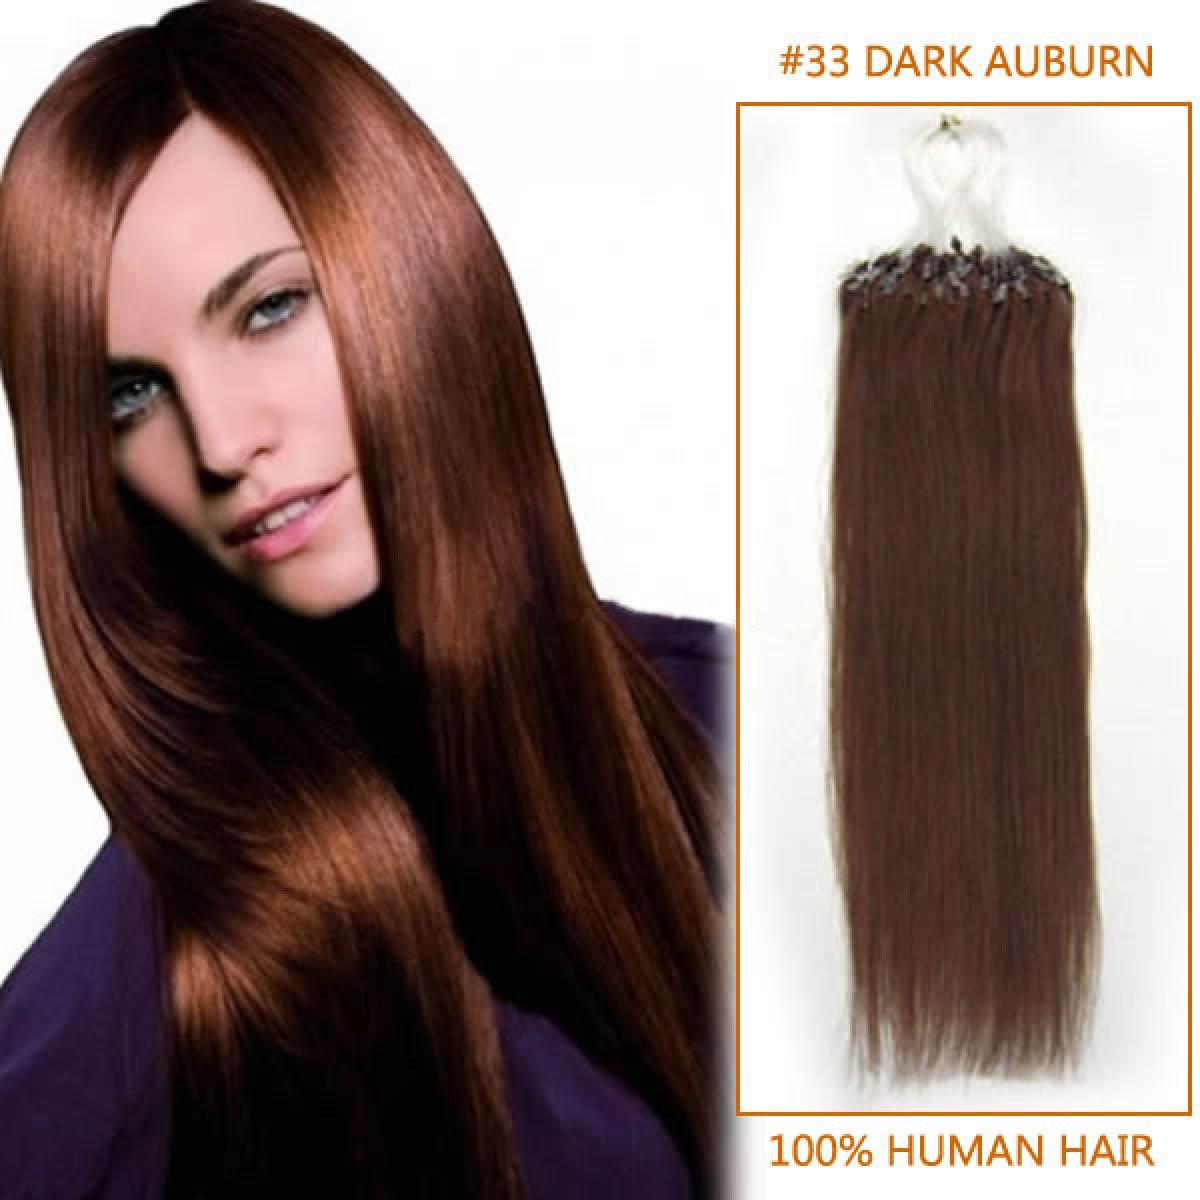 18 Inch 33 Dark Auburn Micro Loop Human Hair Extensions 100s